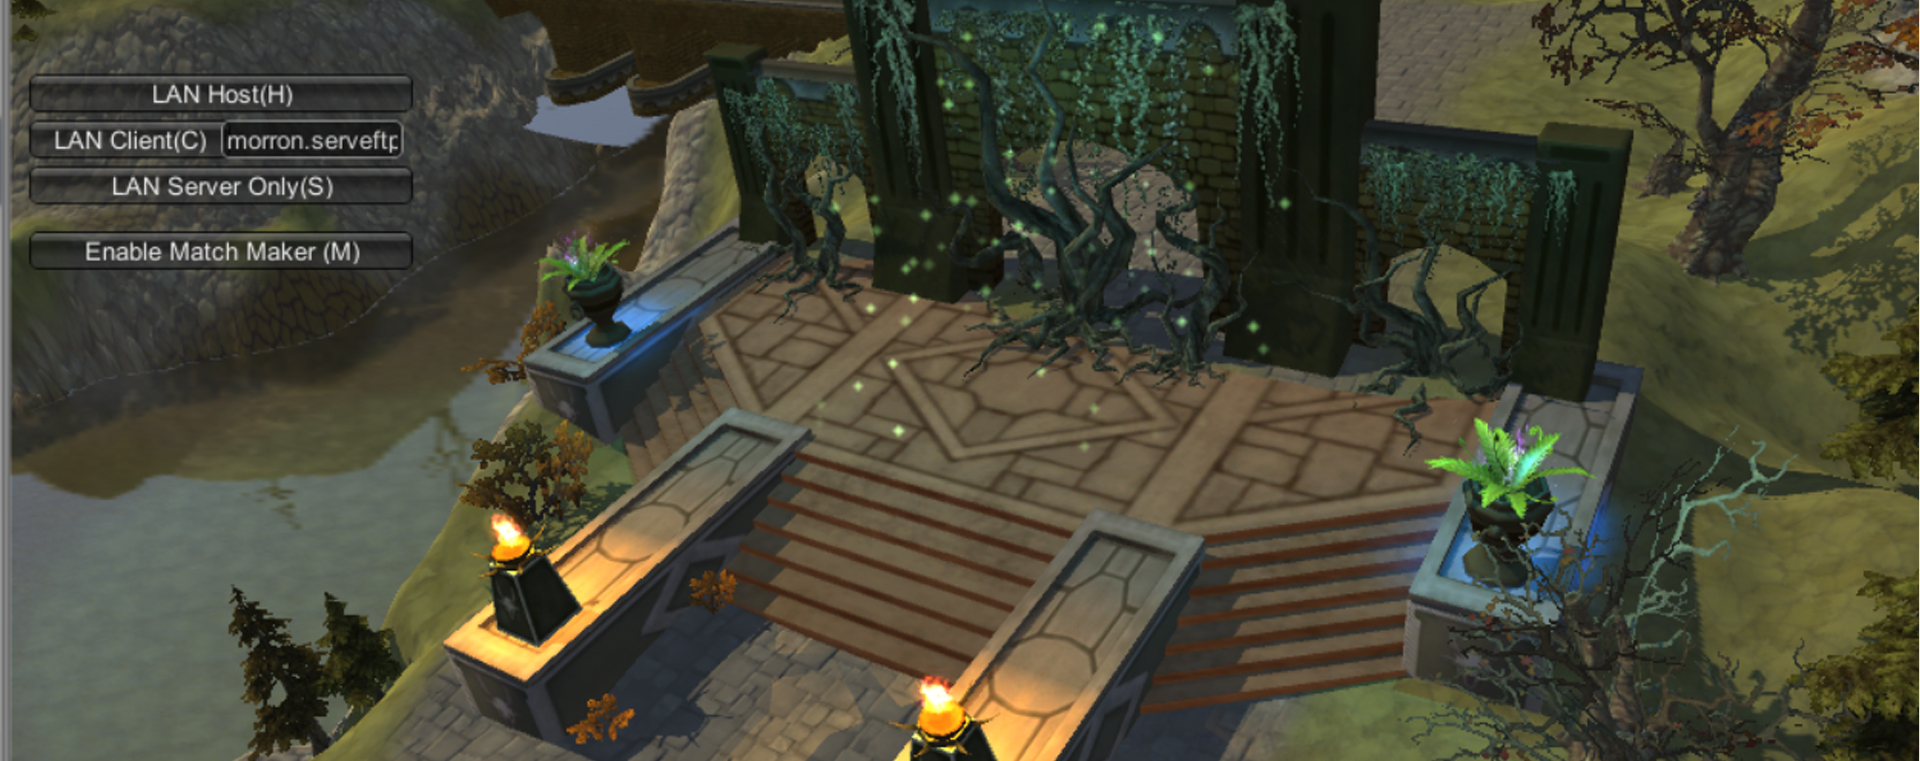 Beat'em up project (map screenshots)